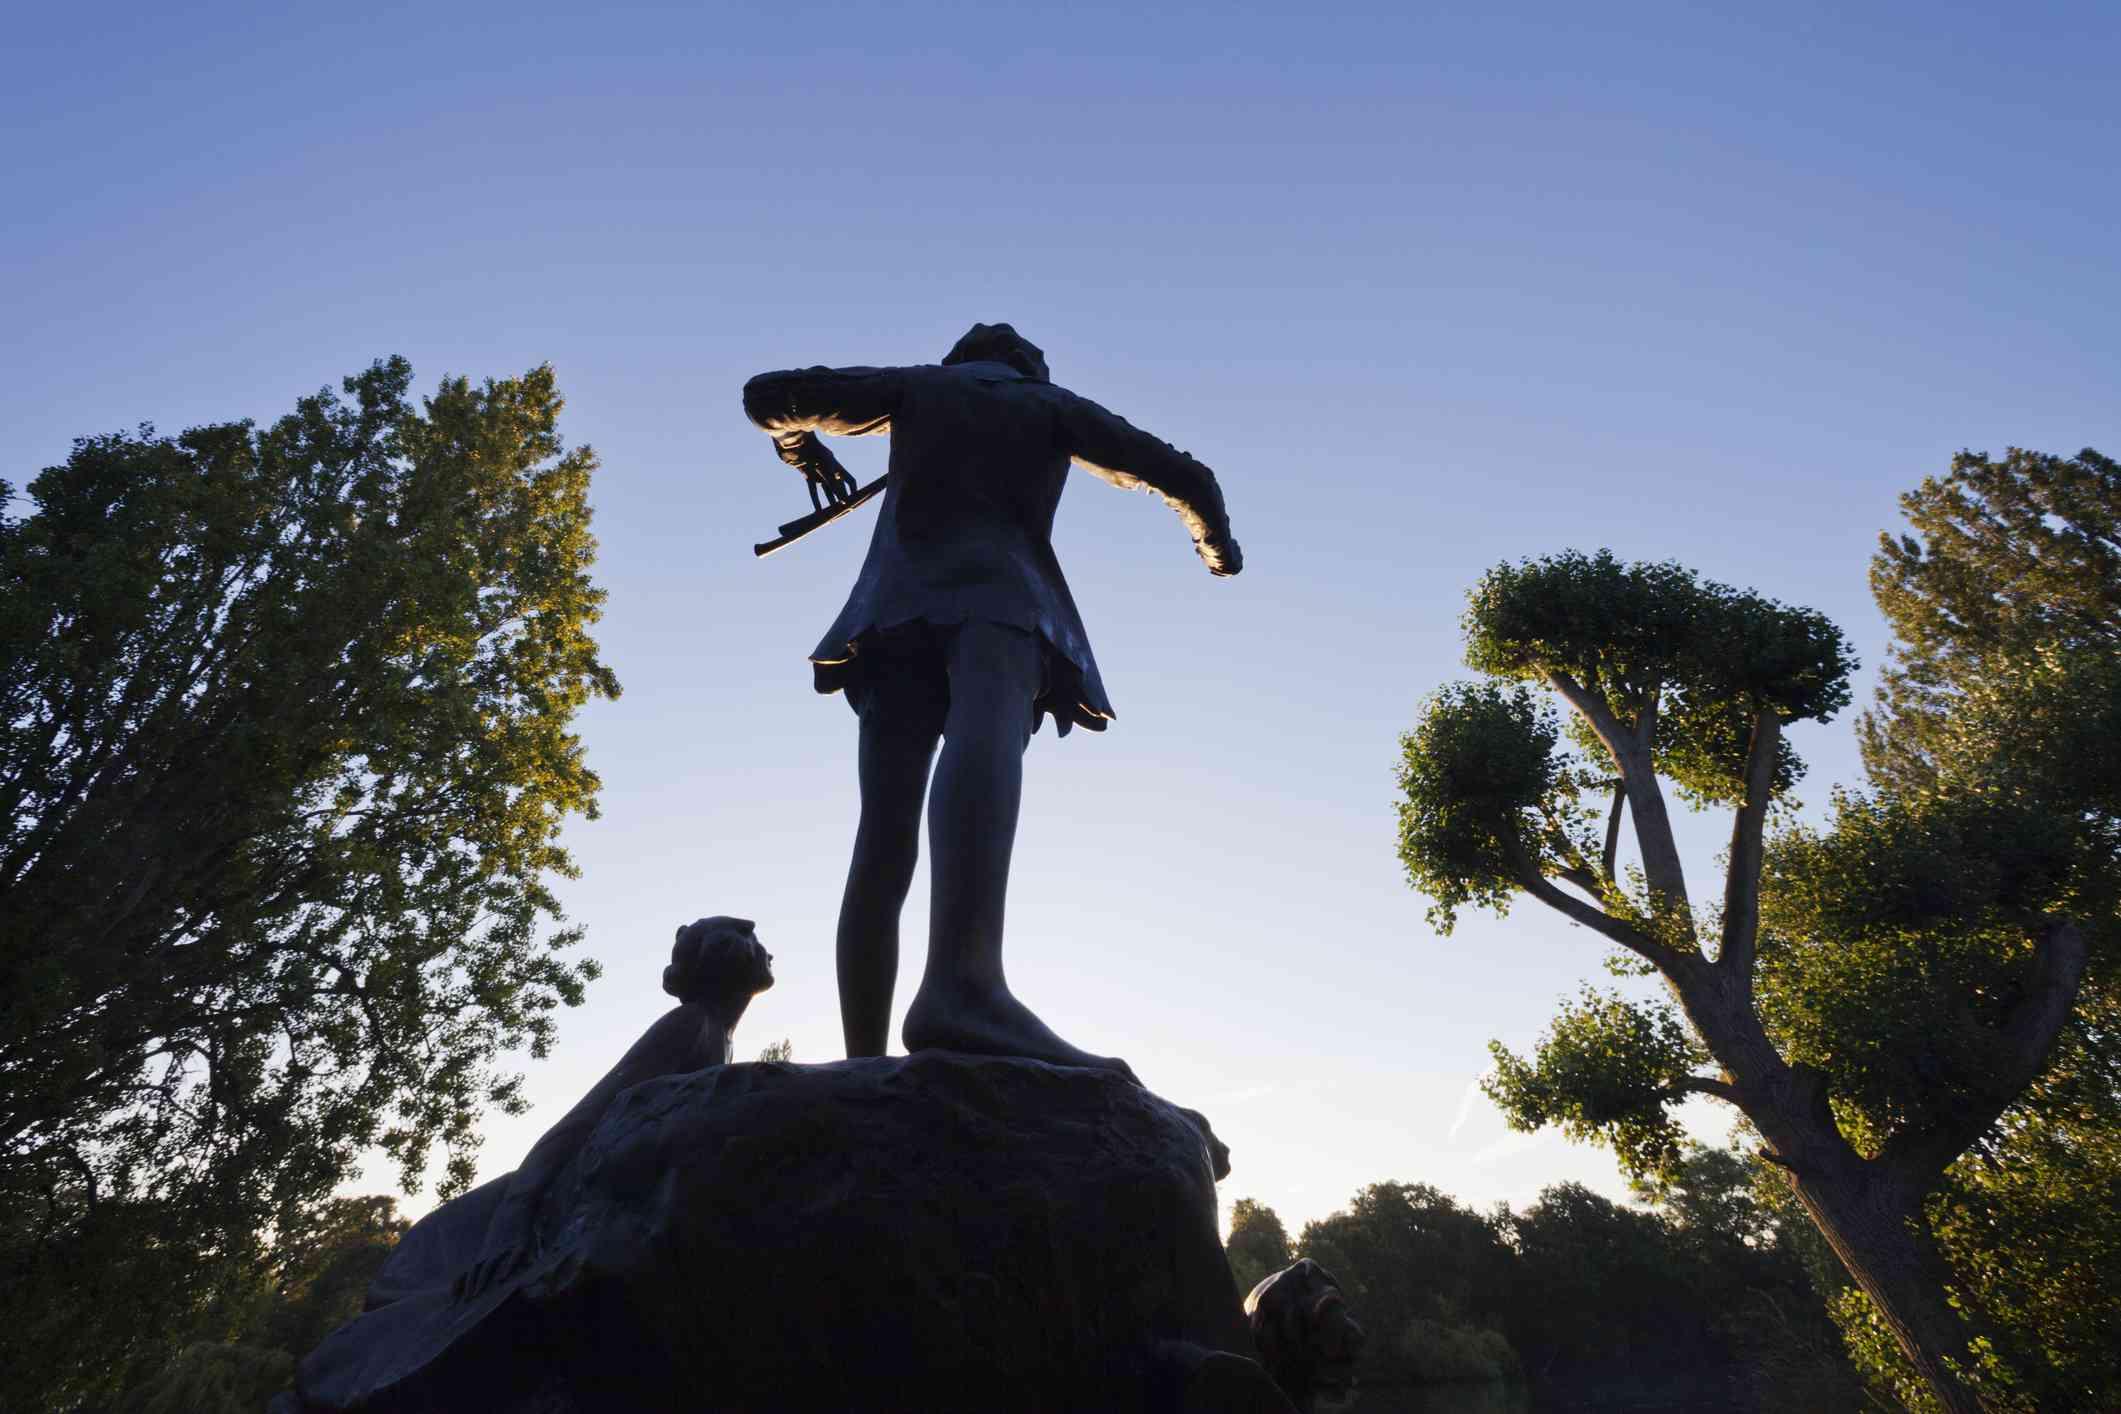 England,London,Hyde Park,Kensington Gardens,Peter Pan Statue